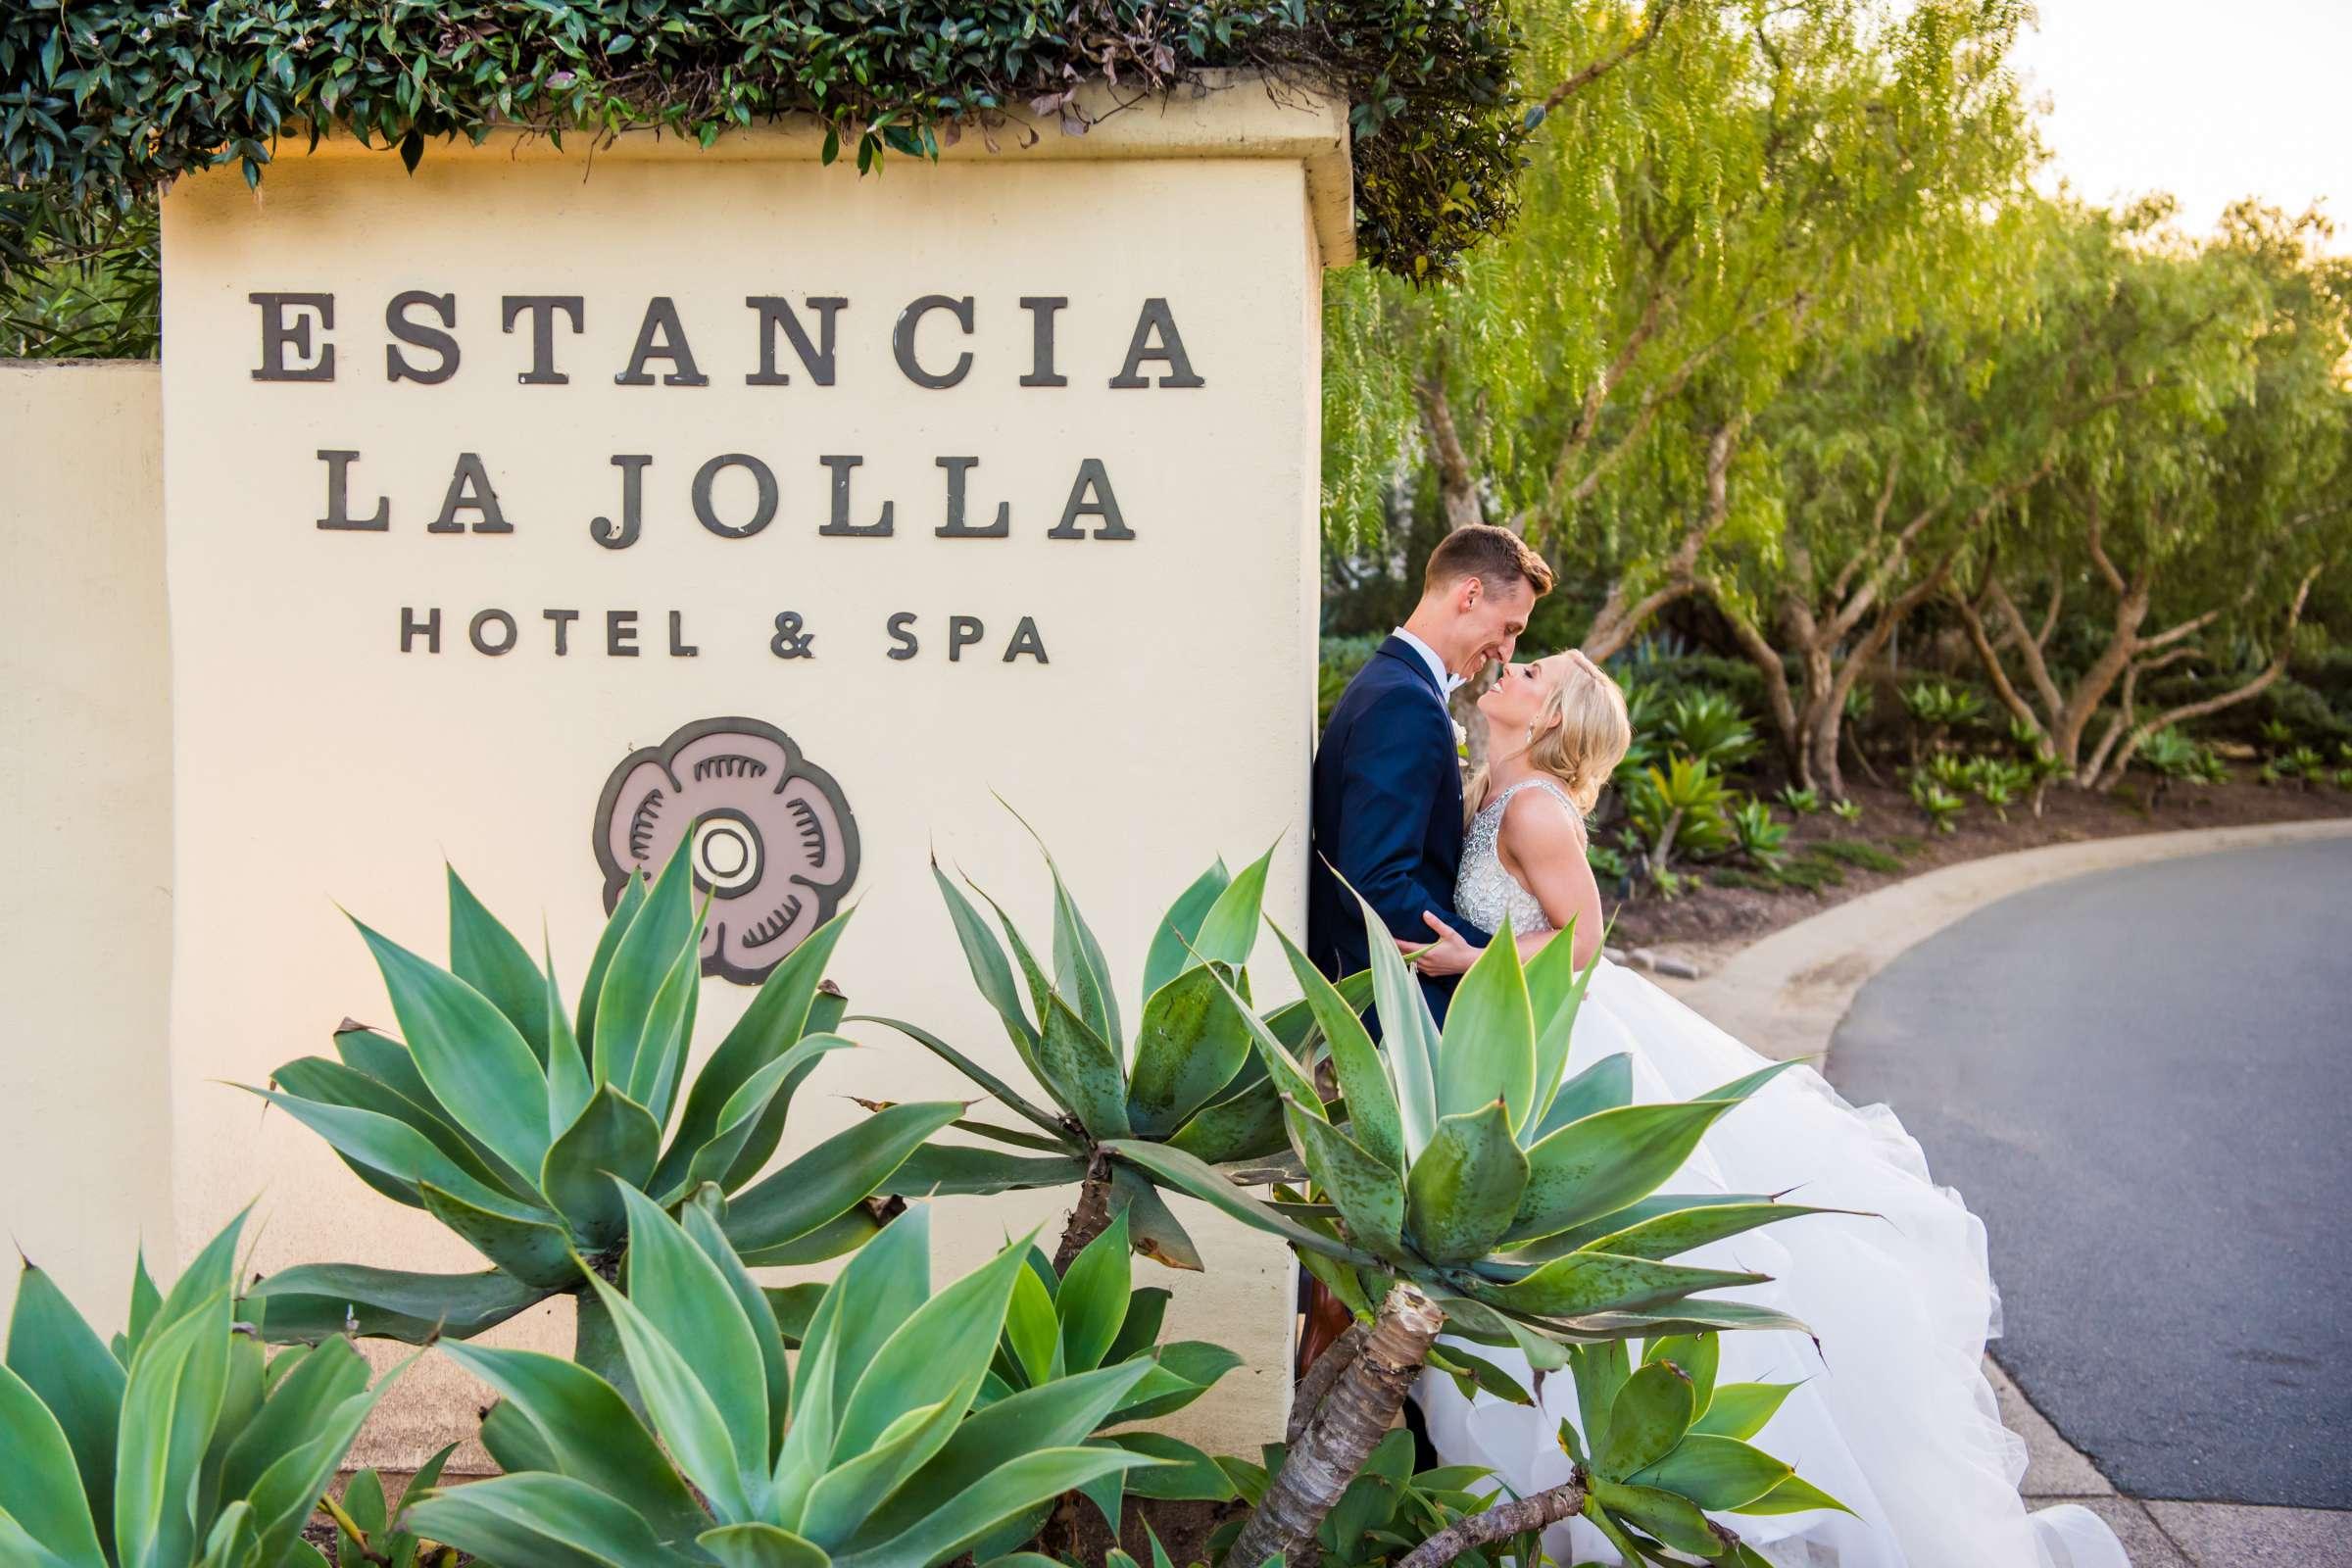 Estancia | San Diego Photographer - True Photography